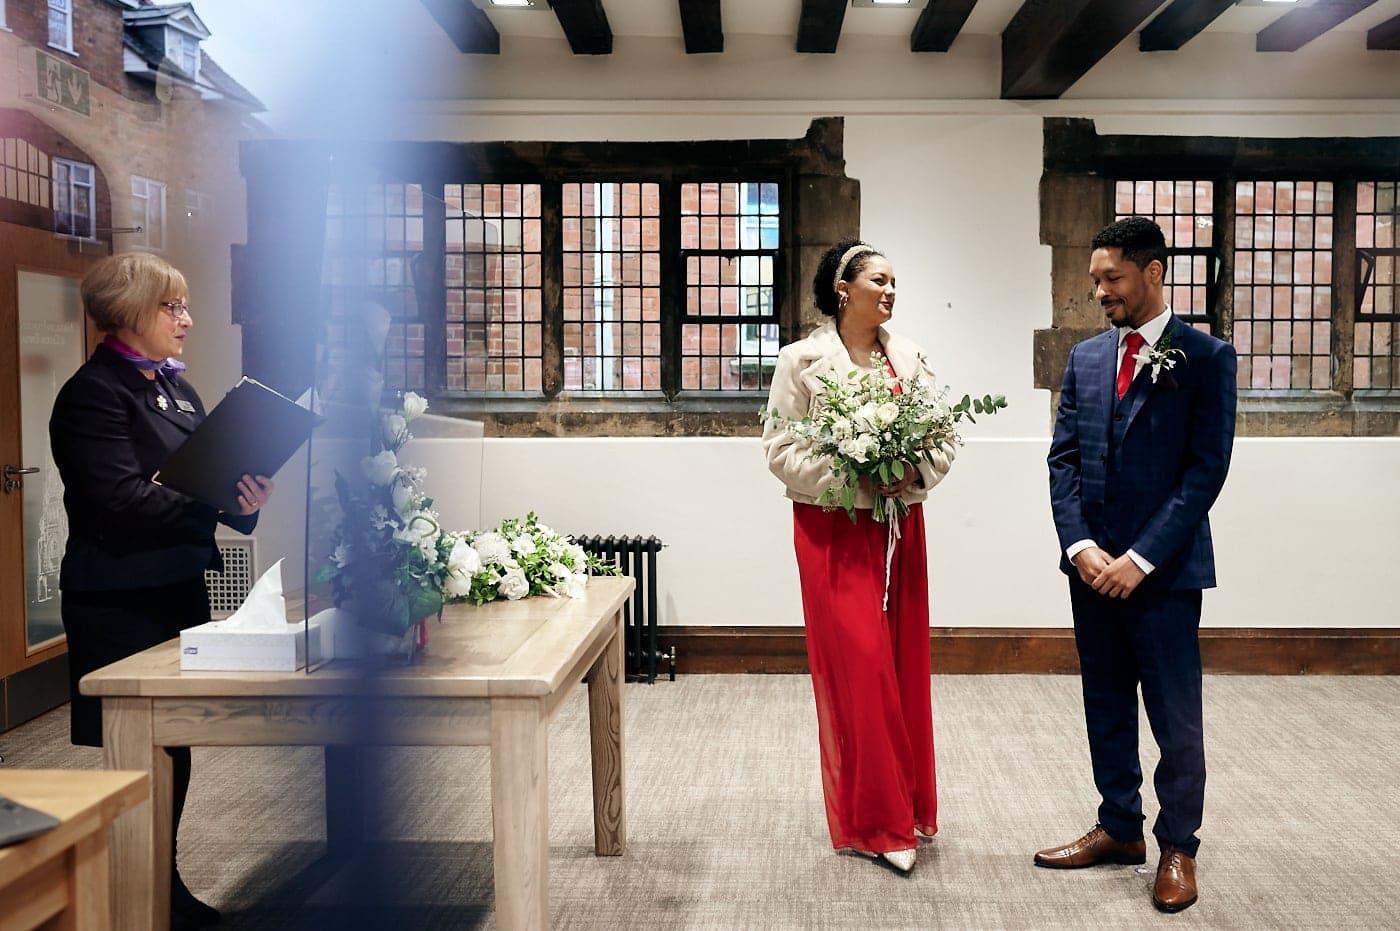 Wedding ceremony in The Henley Room Stratford-upon-Avon